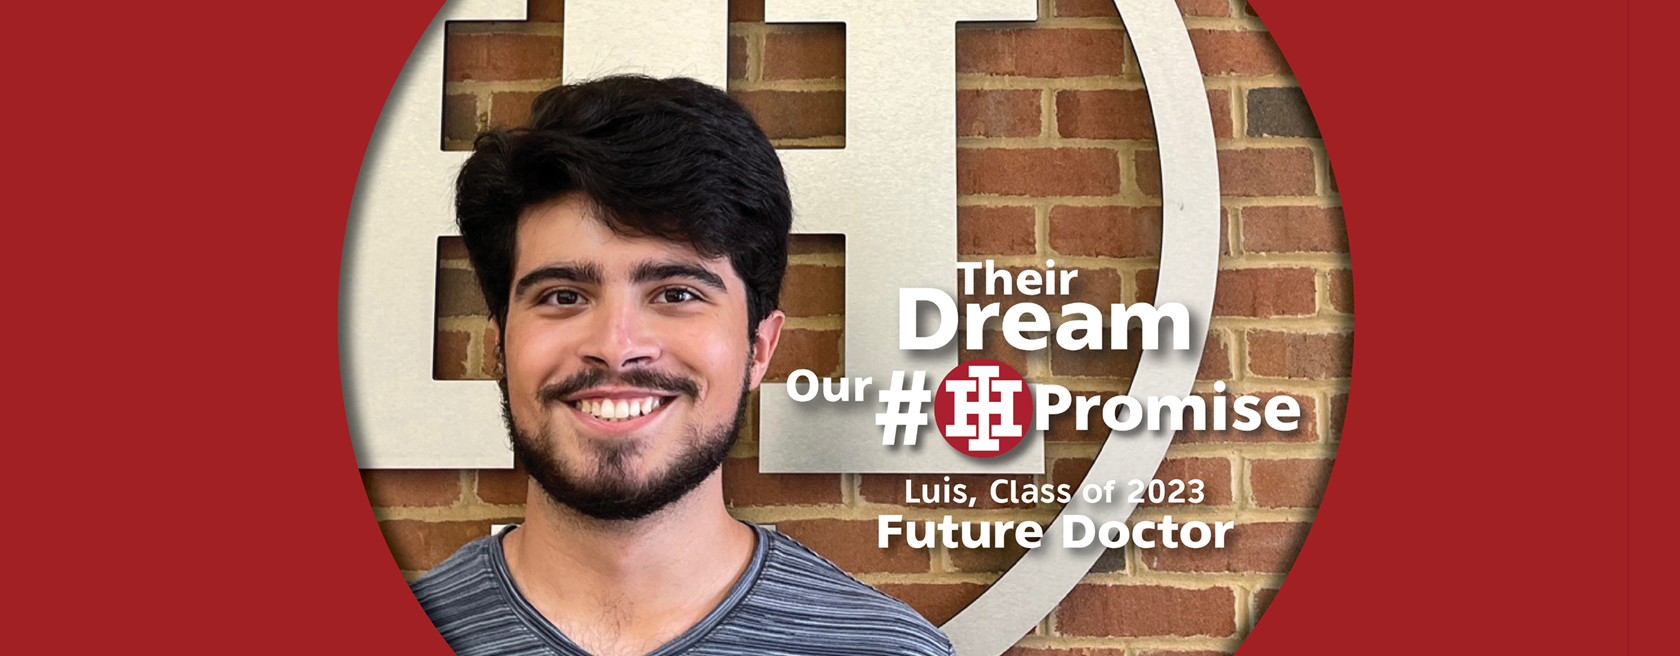 IHHS Student Luis